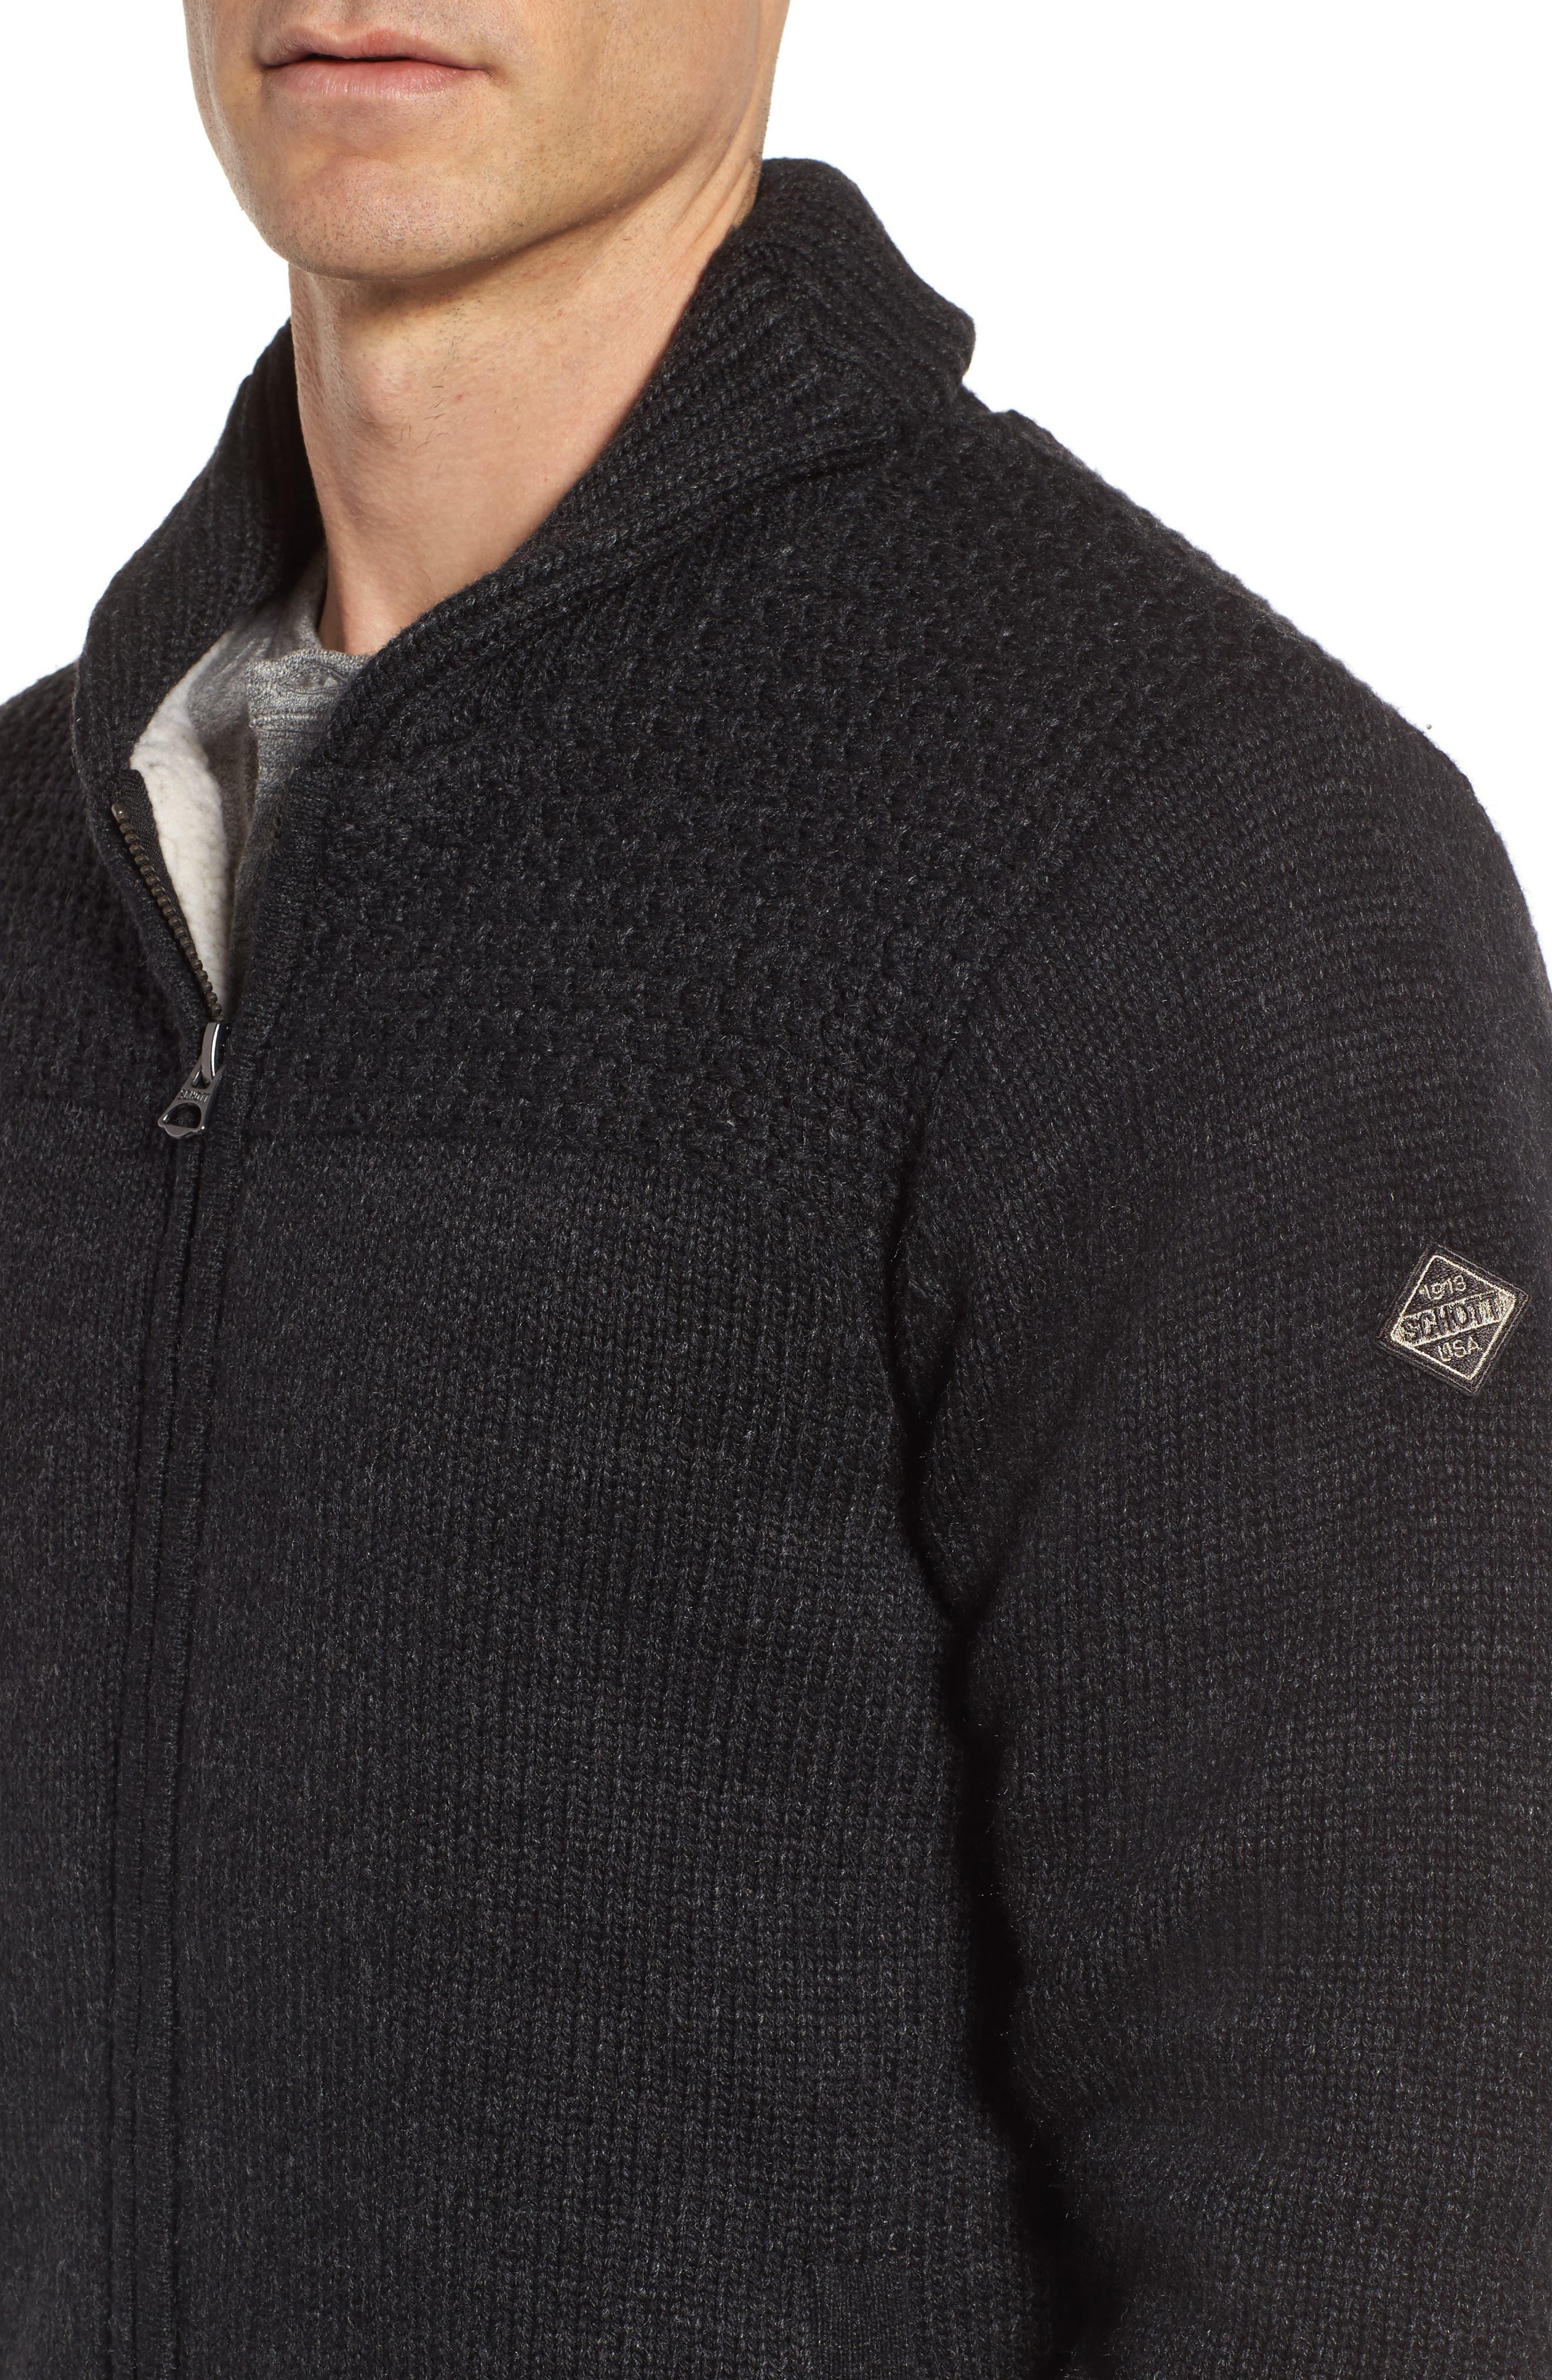 SCHOTT NYC,                             Lined Wool Zip Sweater,                             Alternate thumbnail 4, color,                             BLACK